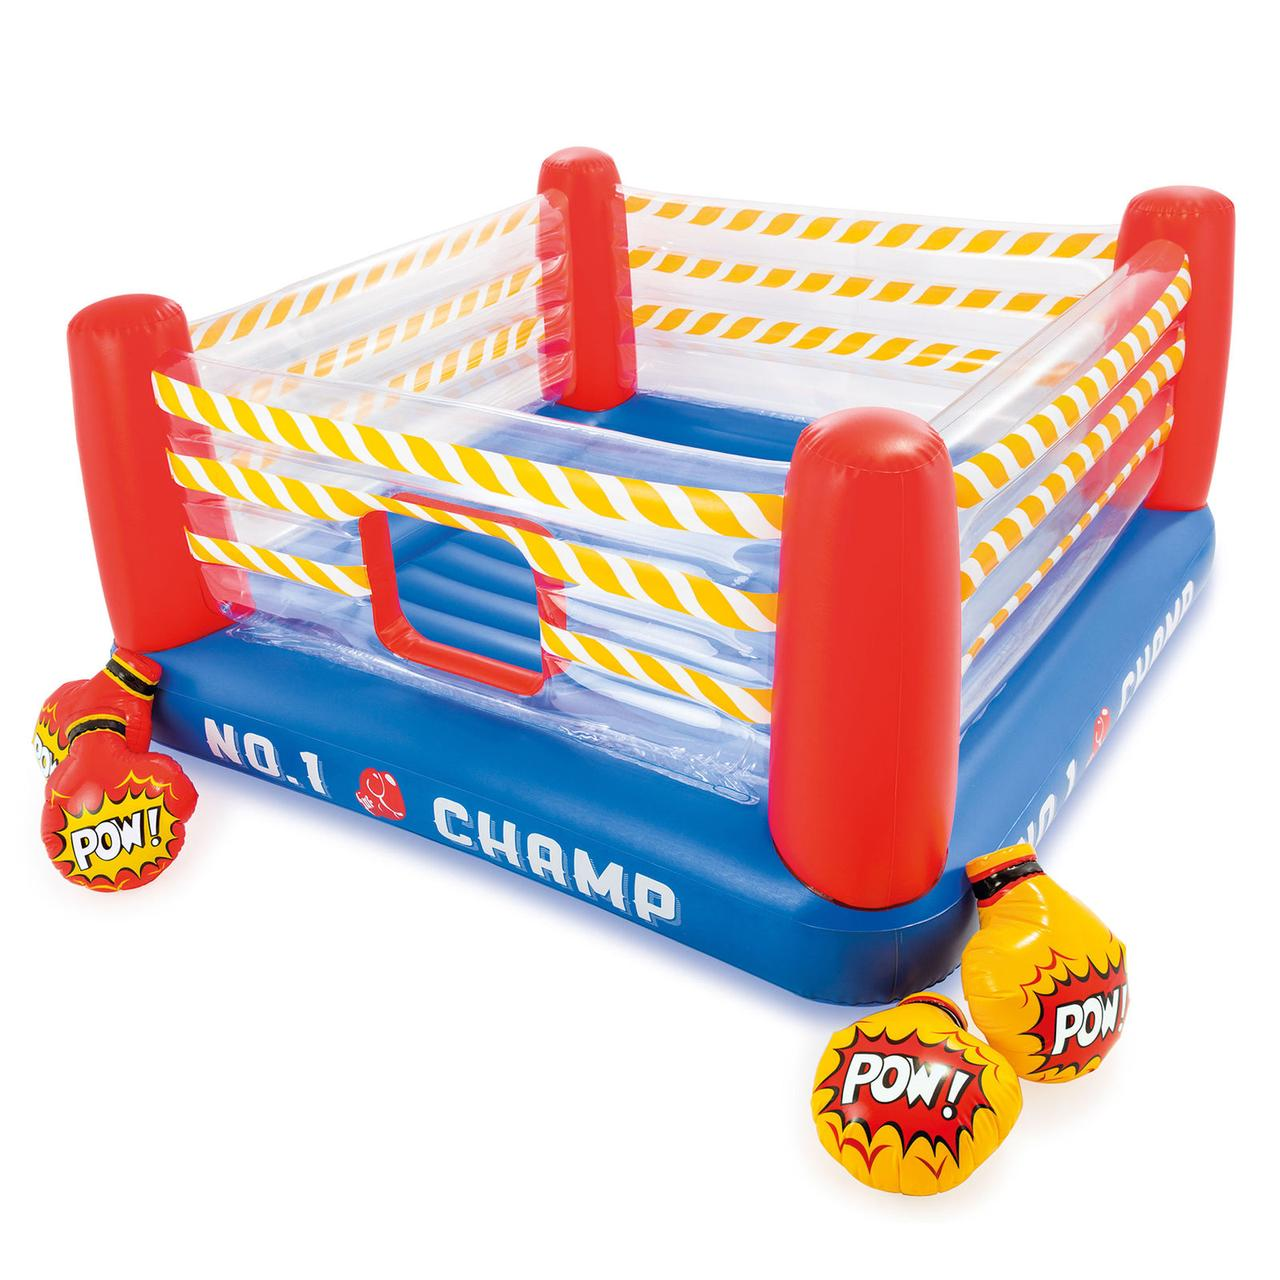 "Детский игровой центр ""Ринг"" Intex 48250 батут, 226х226х110 см (+Доставка)"